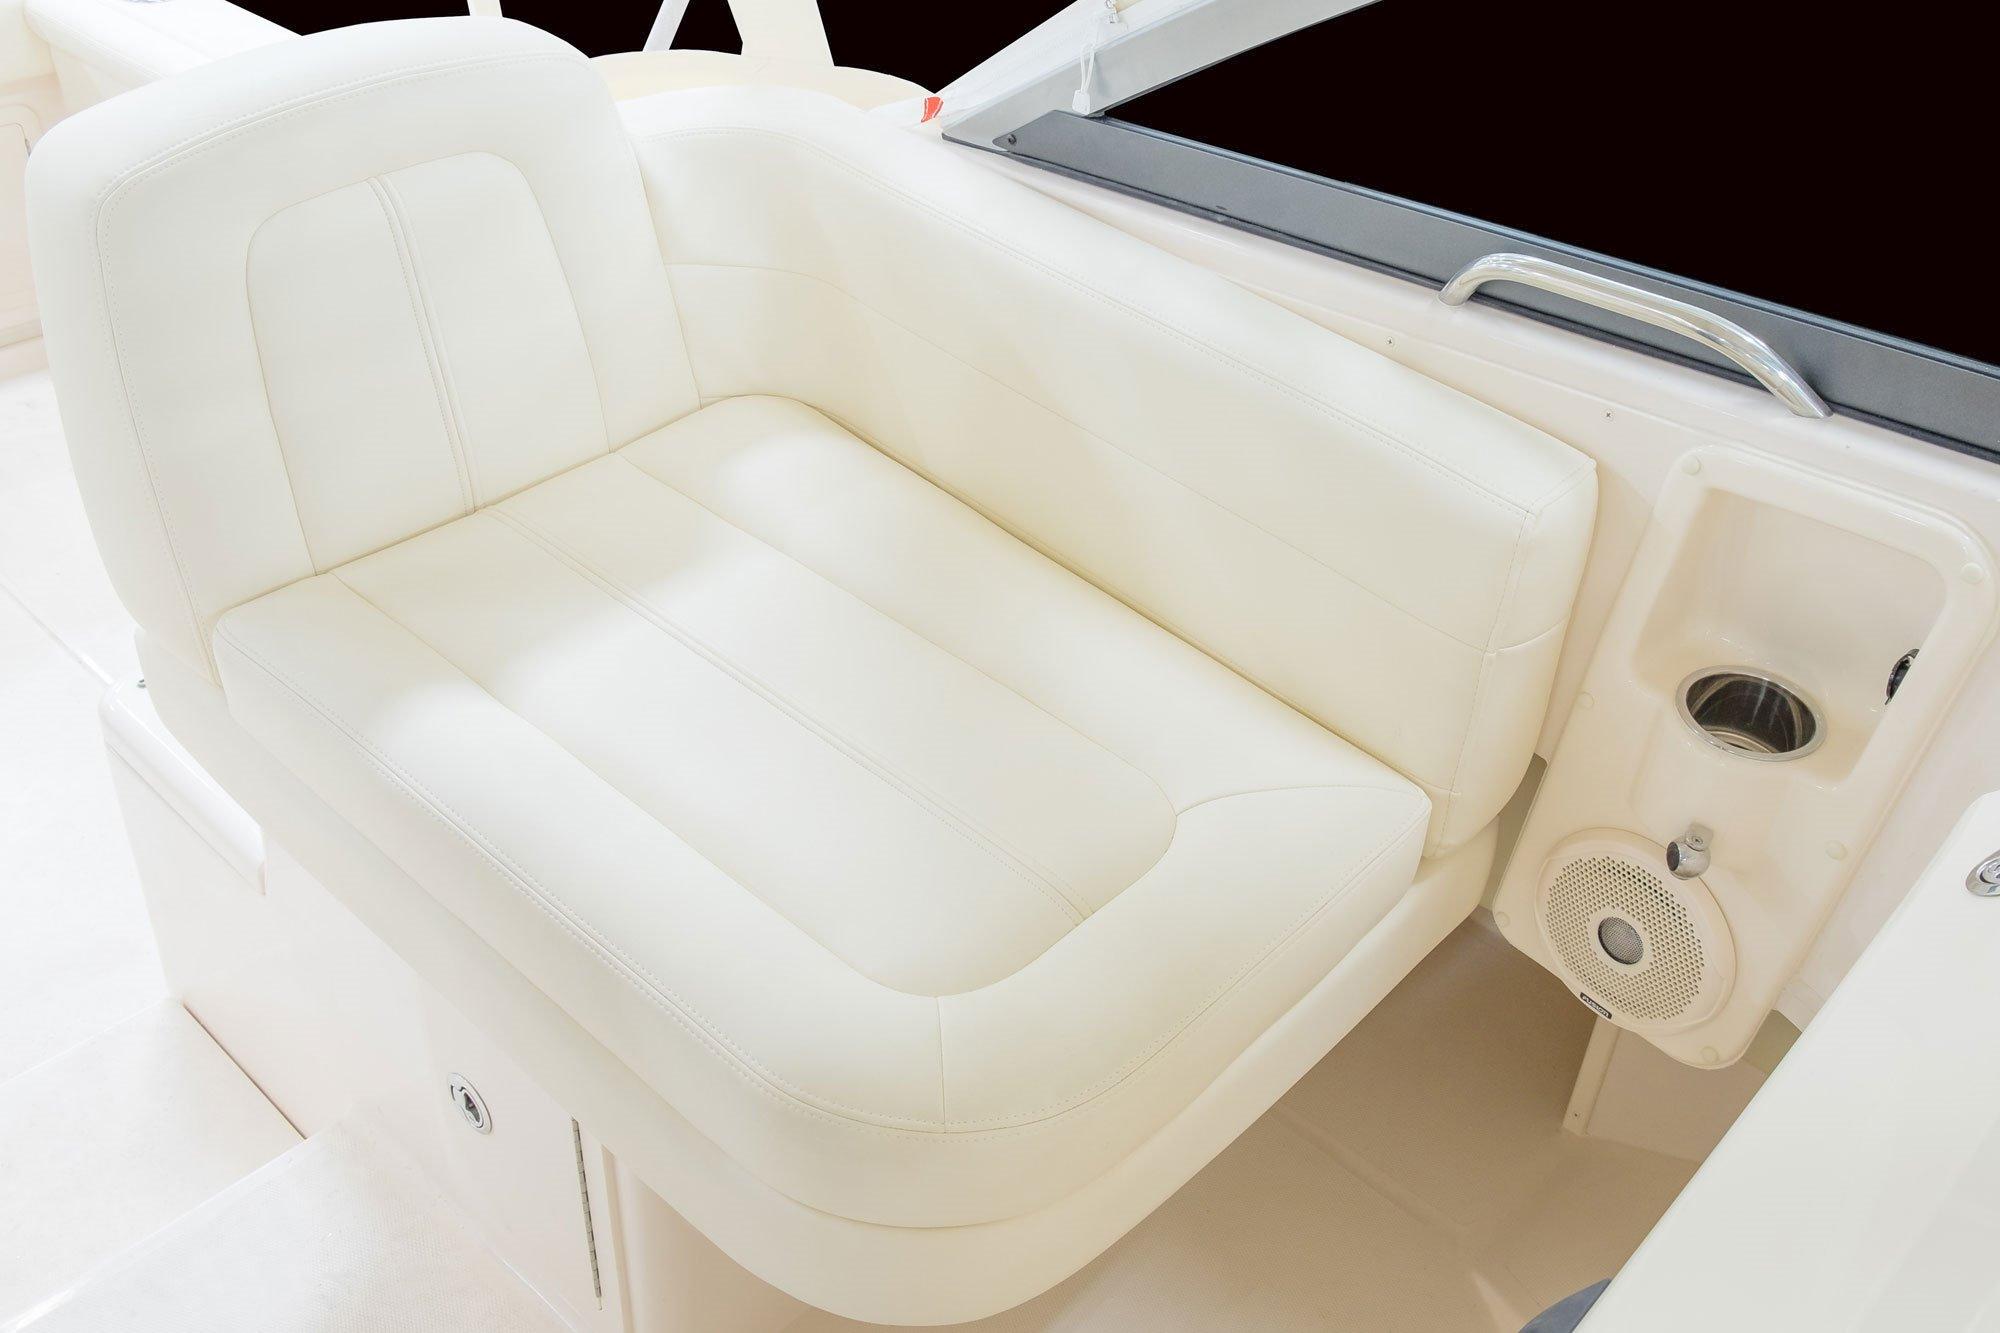 Grady-White Marlin 300 30 foot Walkaround Cabin Boat Companion Seating